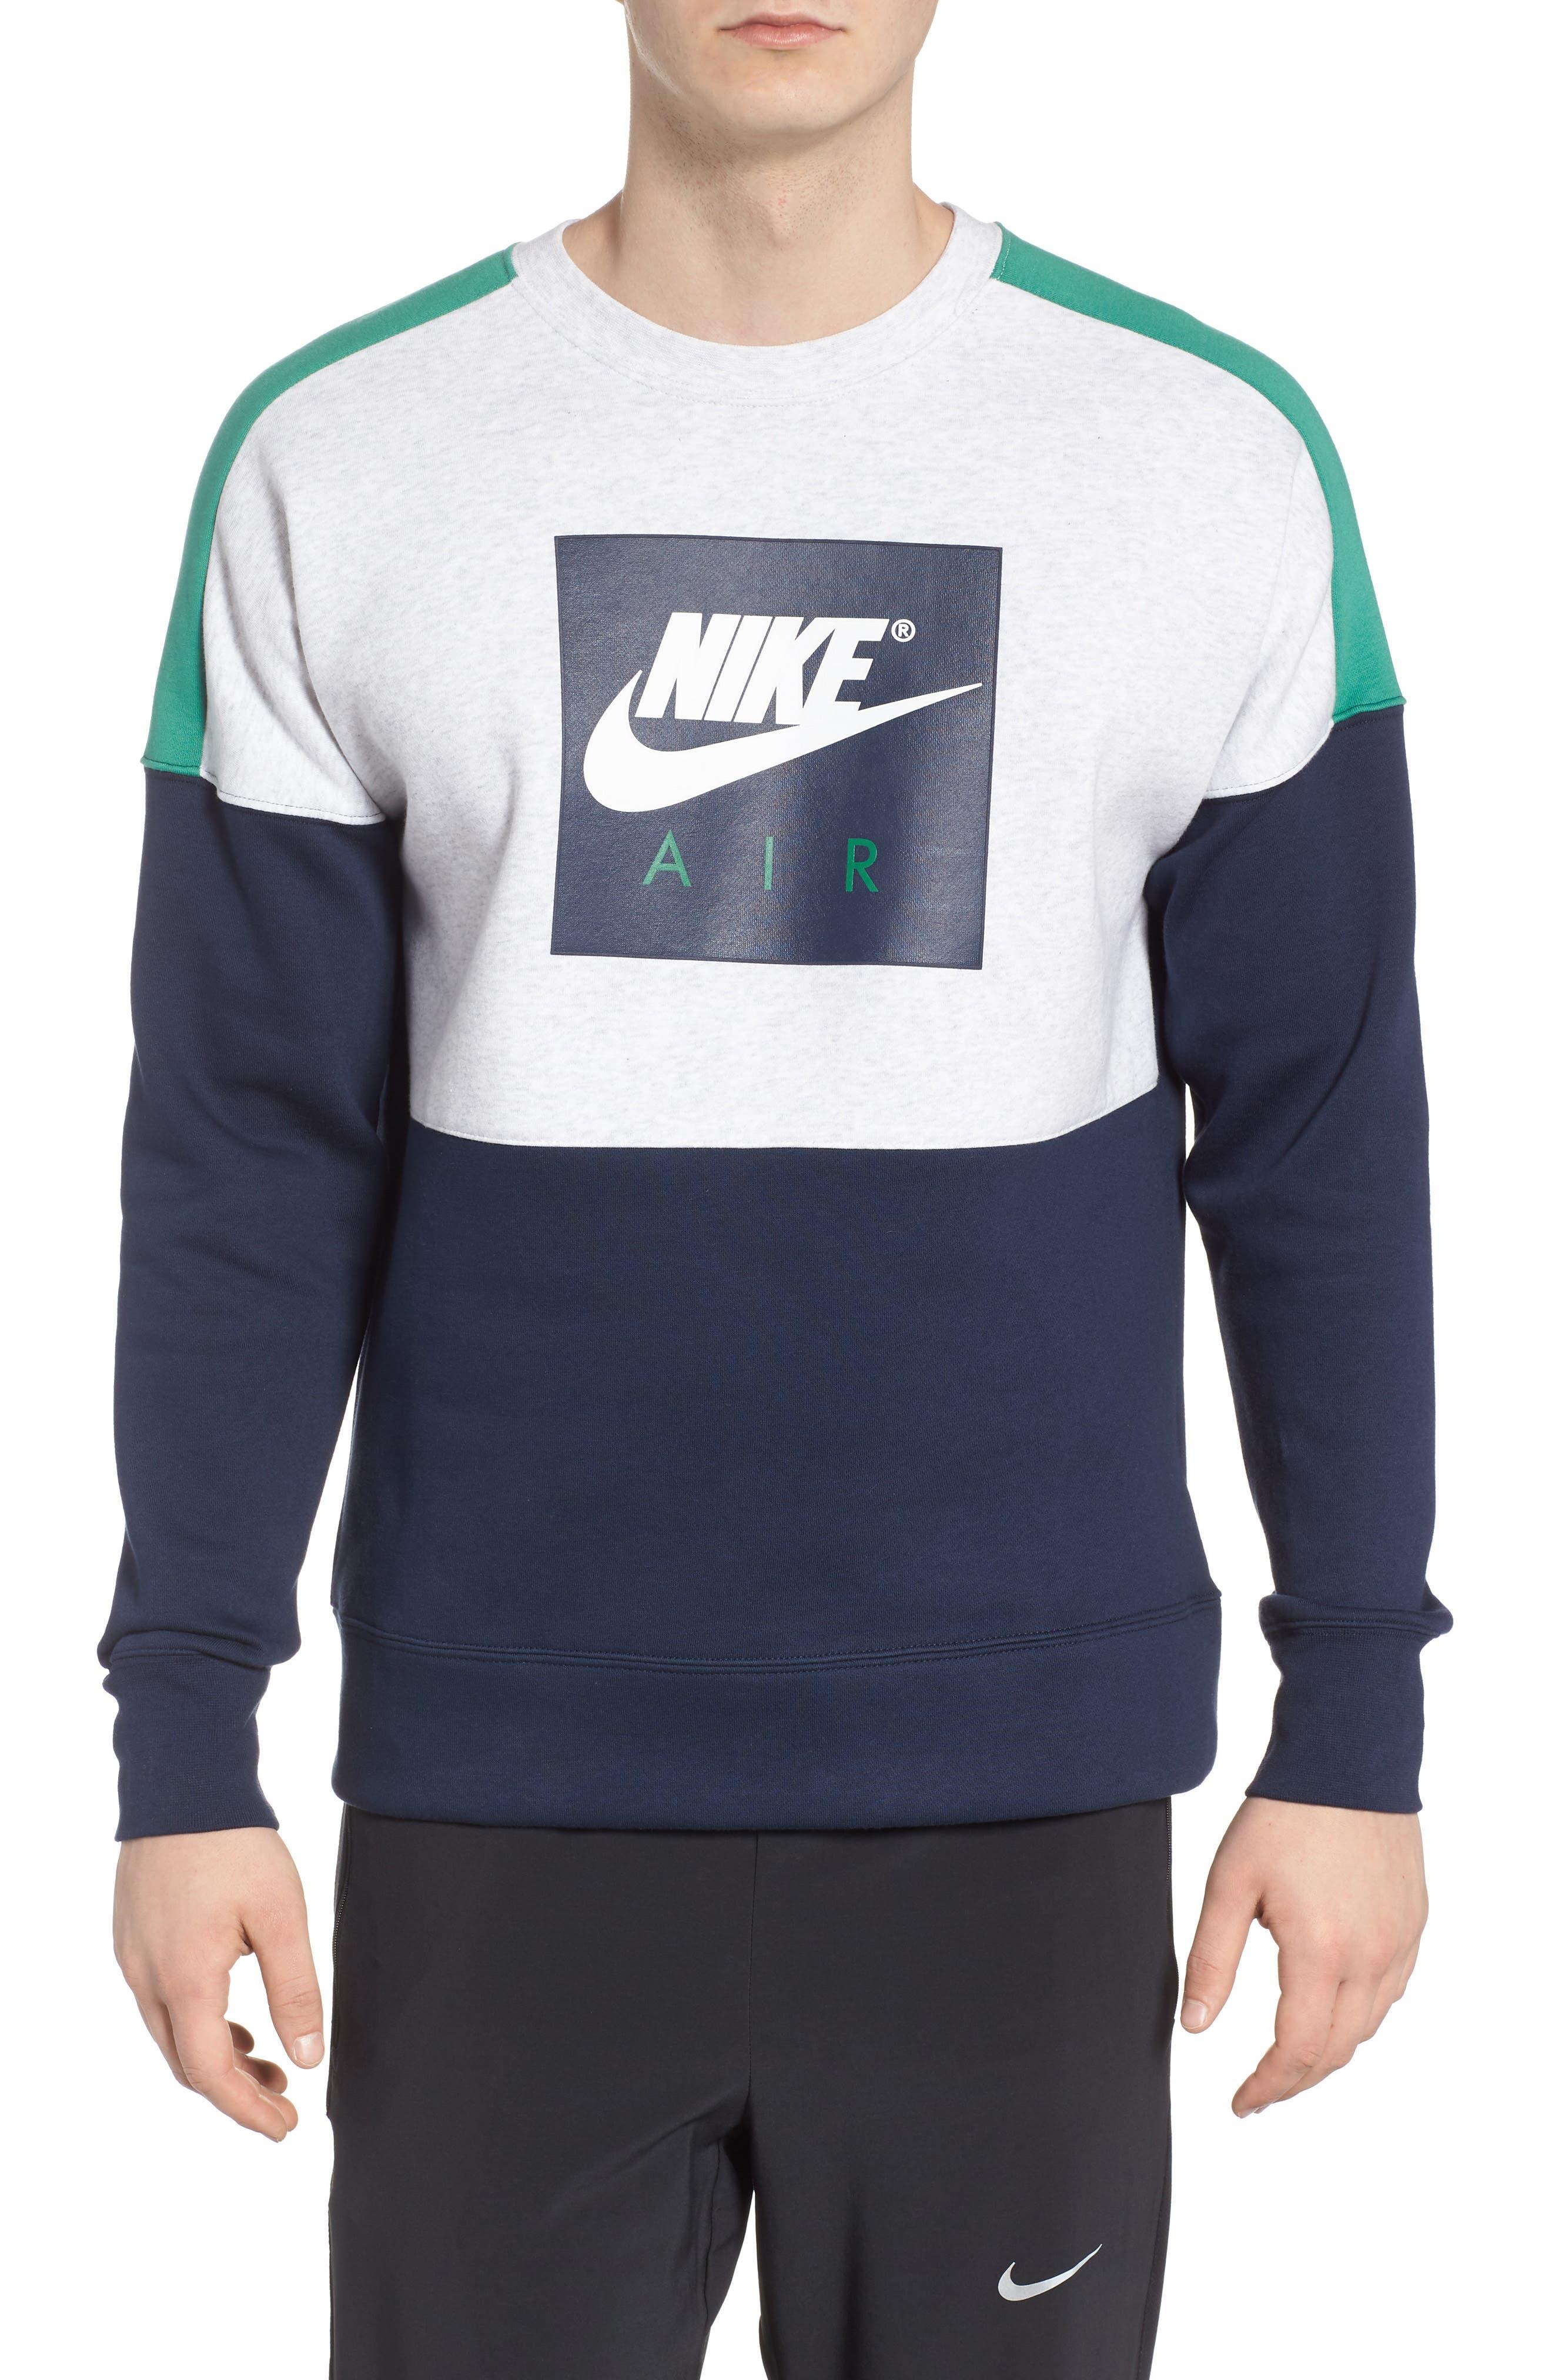 NSW Air Crewneck Sweatshirt,                             Main thumbnail 1, color,                             Birch/ Green/ Obsidian/ White